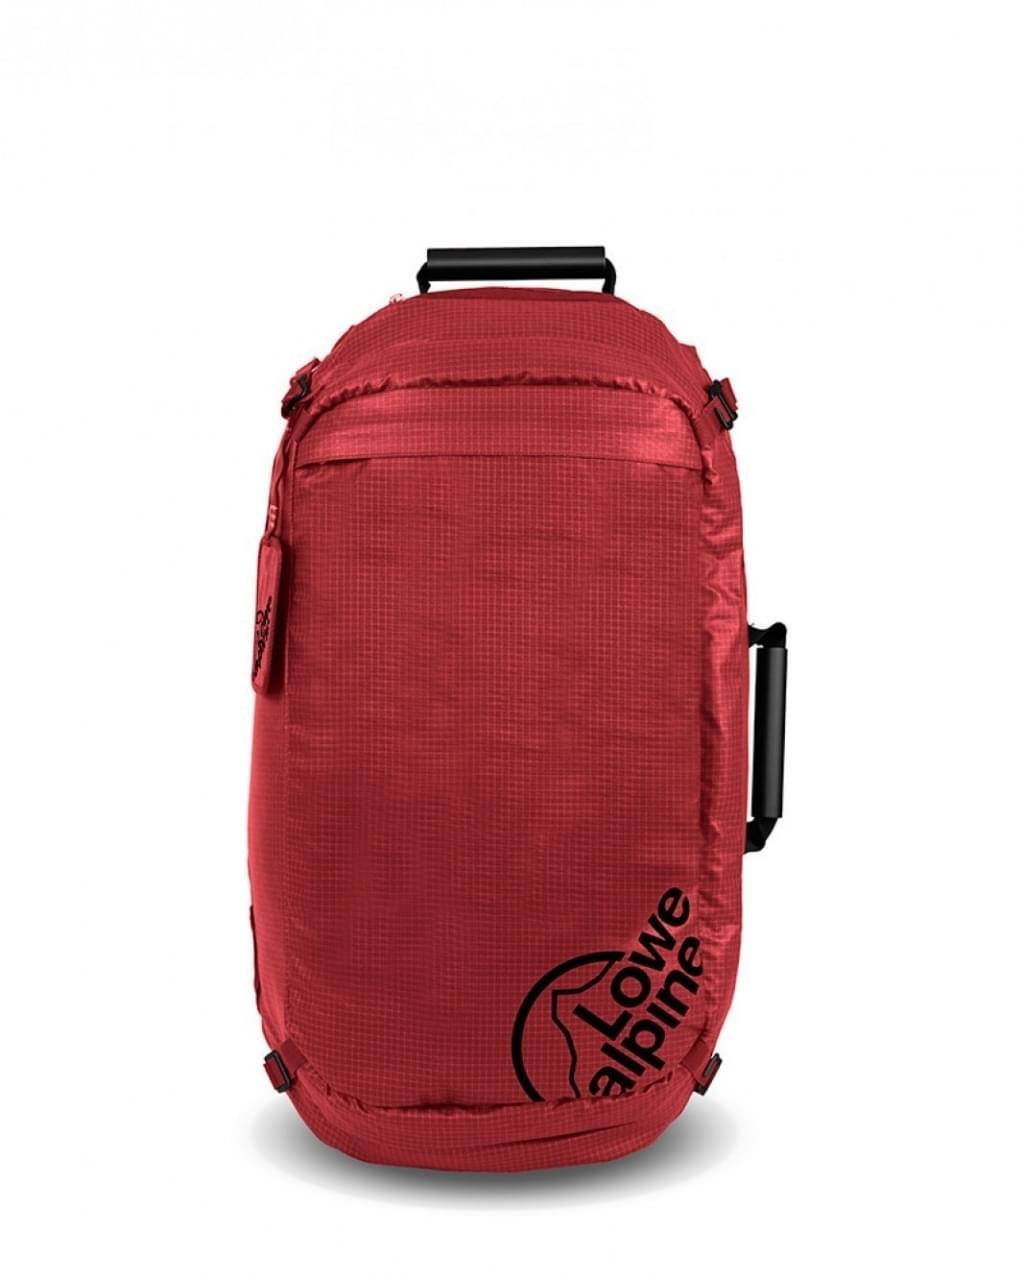 Lowe Alpine AT Kit bag 40